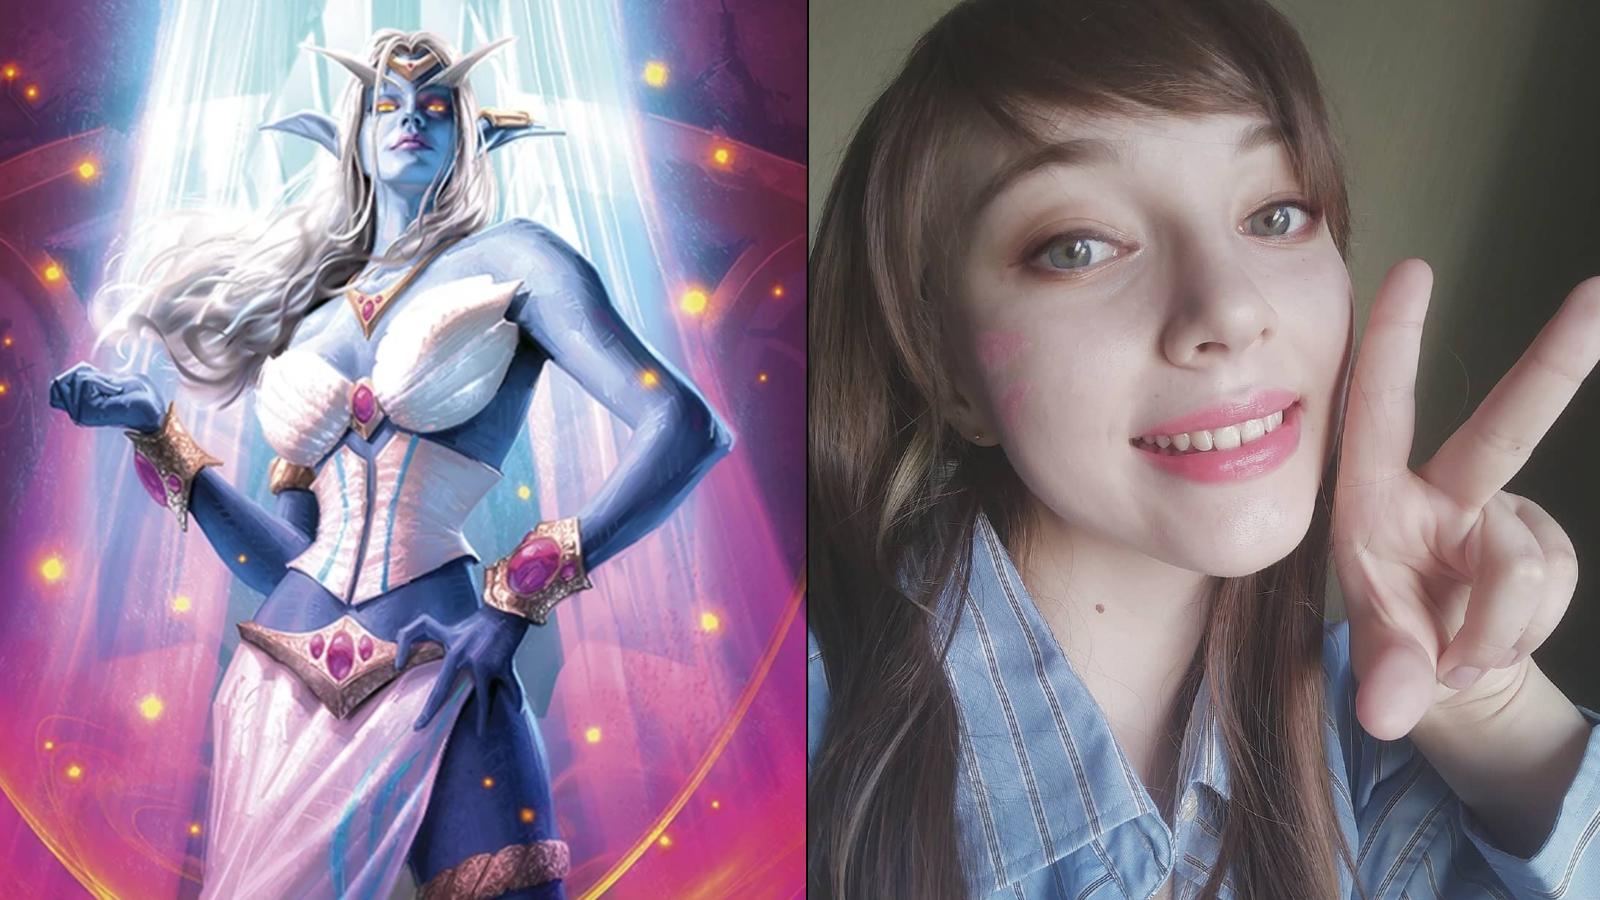 Cosplay World of Warcraft Blizzard Entertainment Queen Azshara